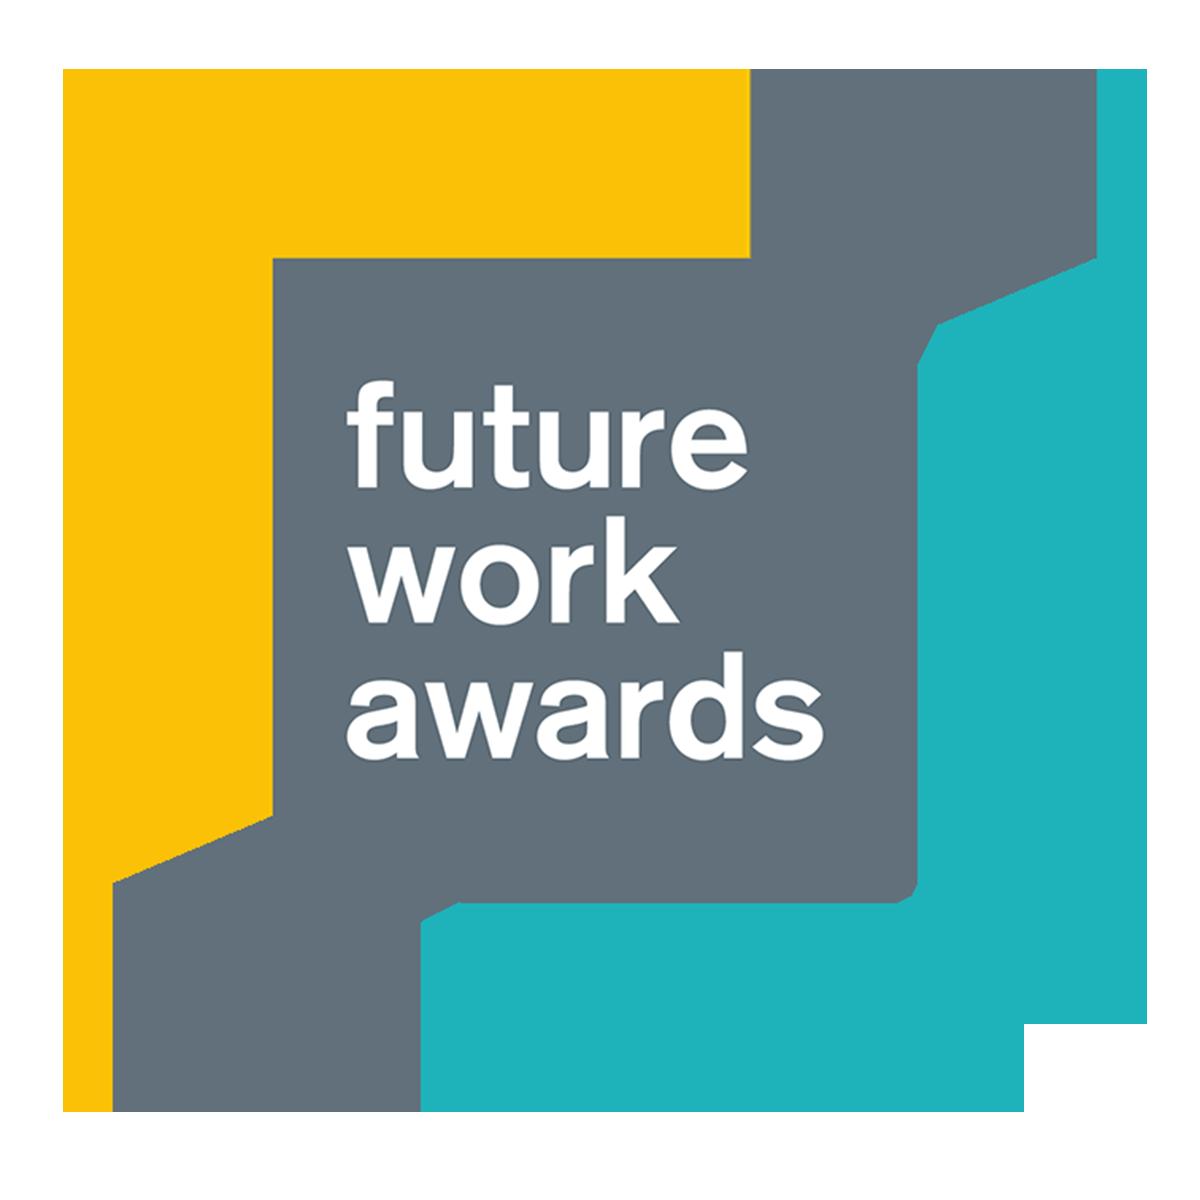 future work awards rsa